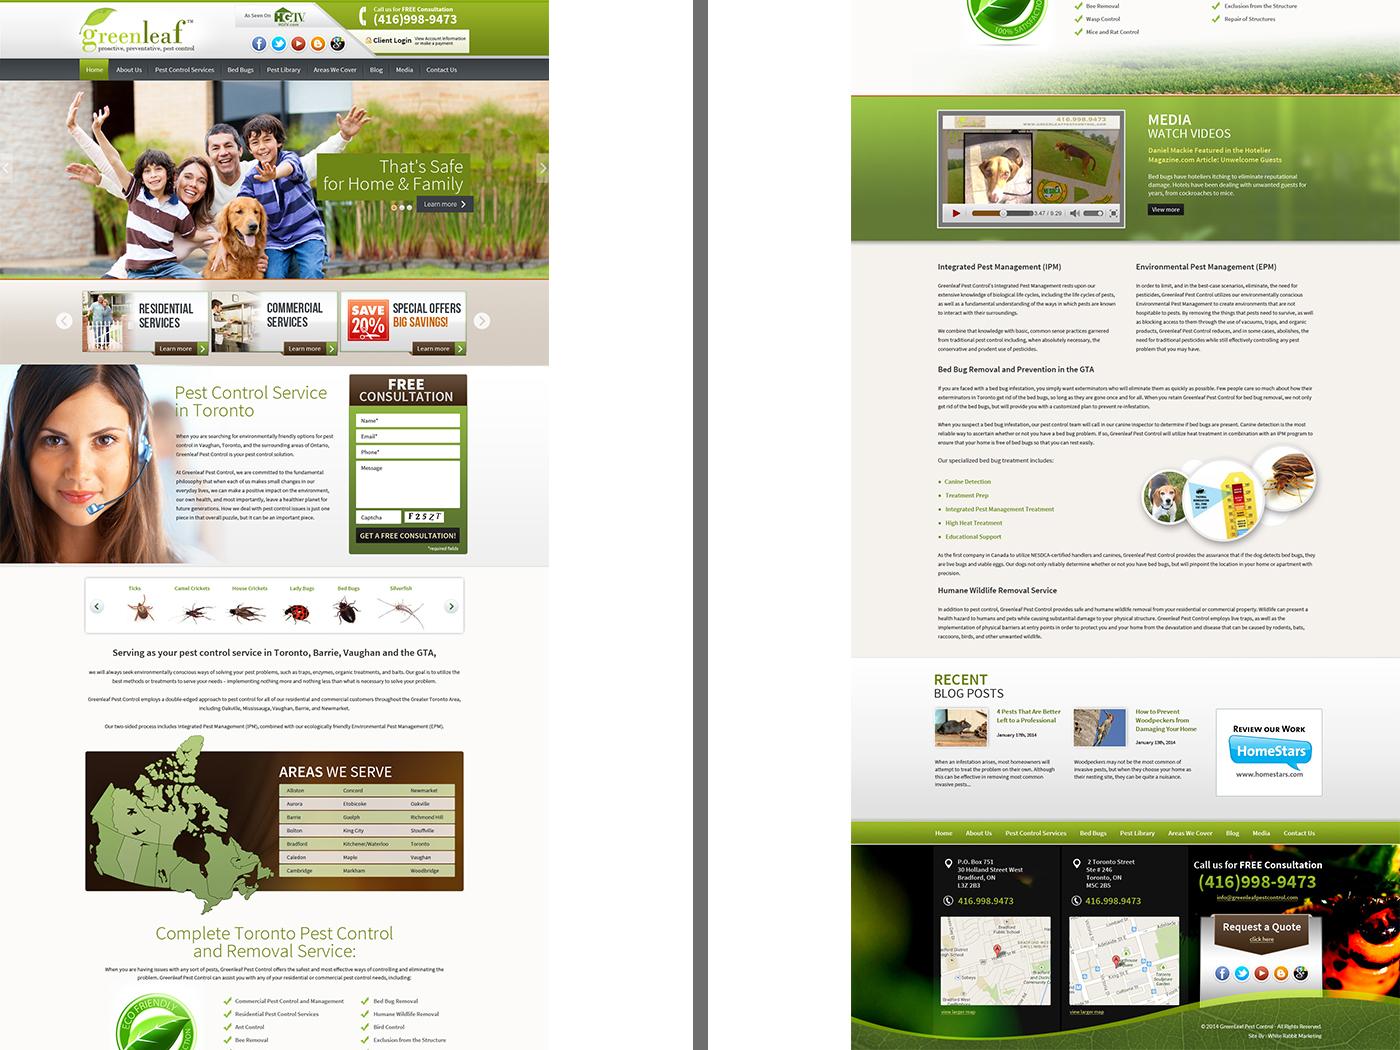 Green Leaf website layout design by Rajendra Singh on Dribbble